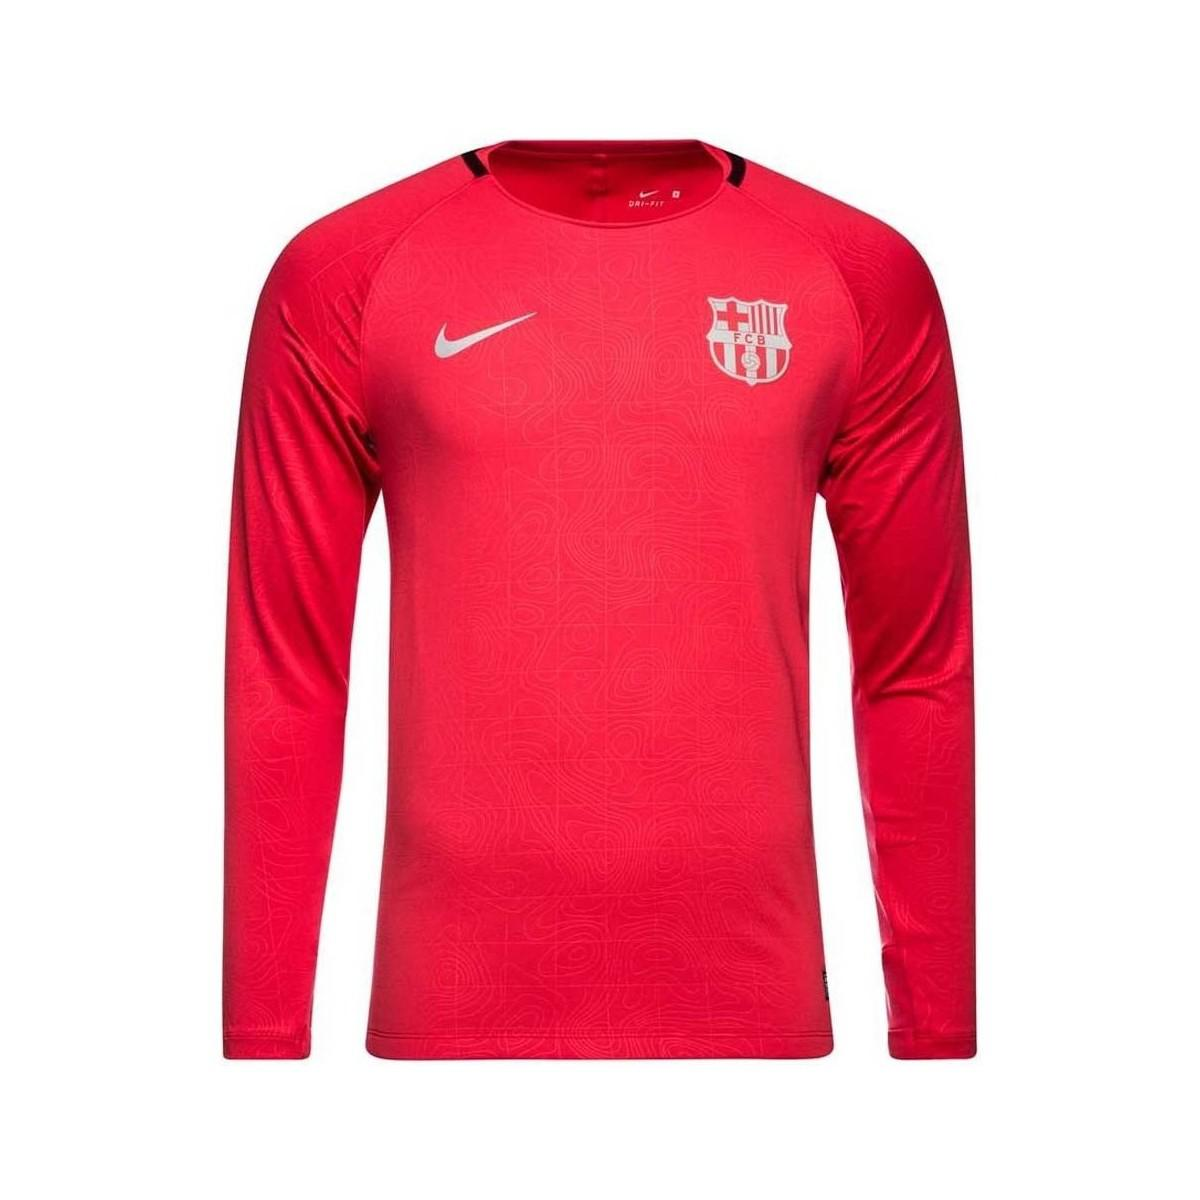 793f1d956 Nike 2018-2019 Barcelona Long Sleeve Training Shirt (tropical ...